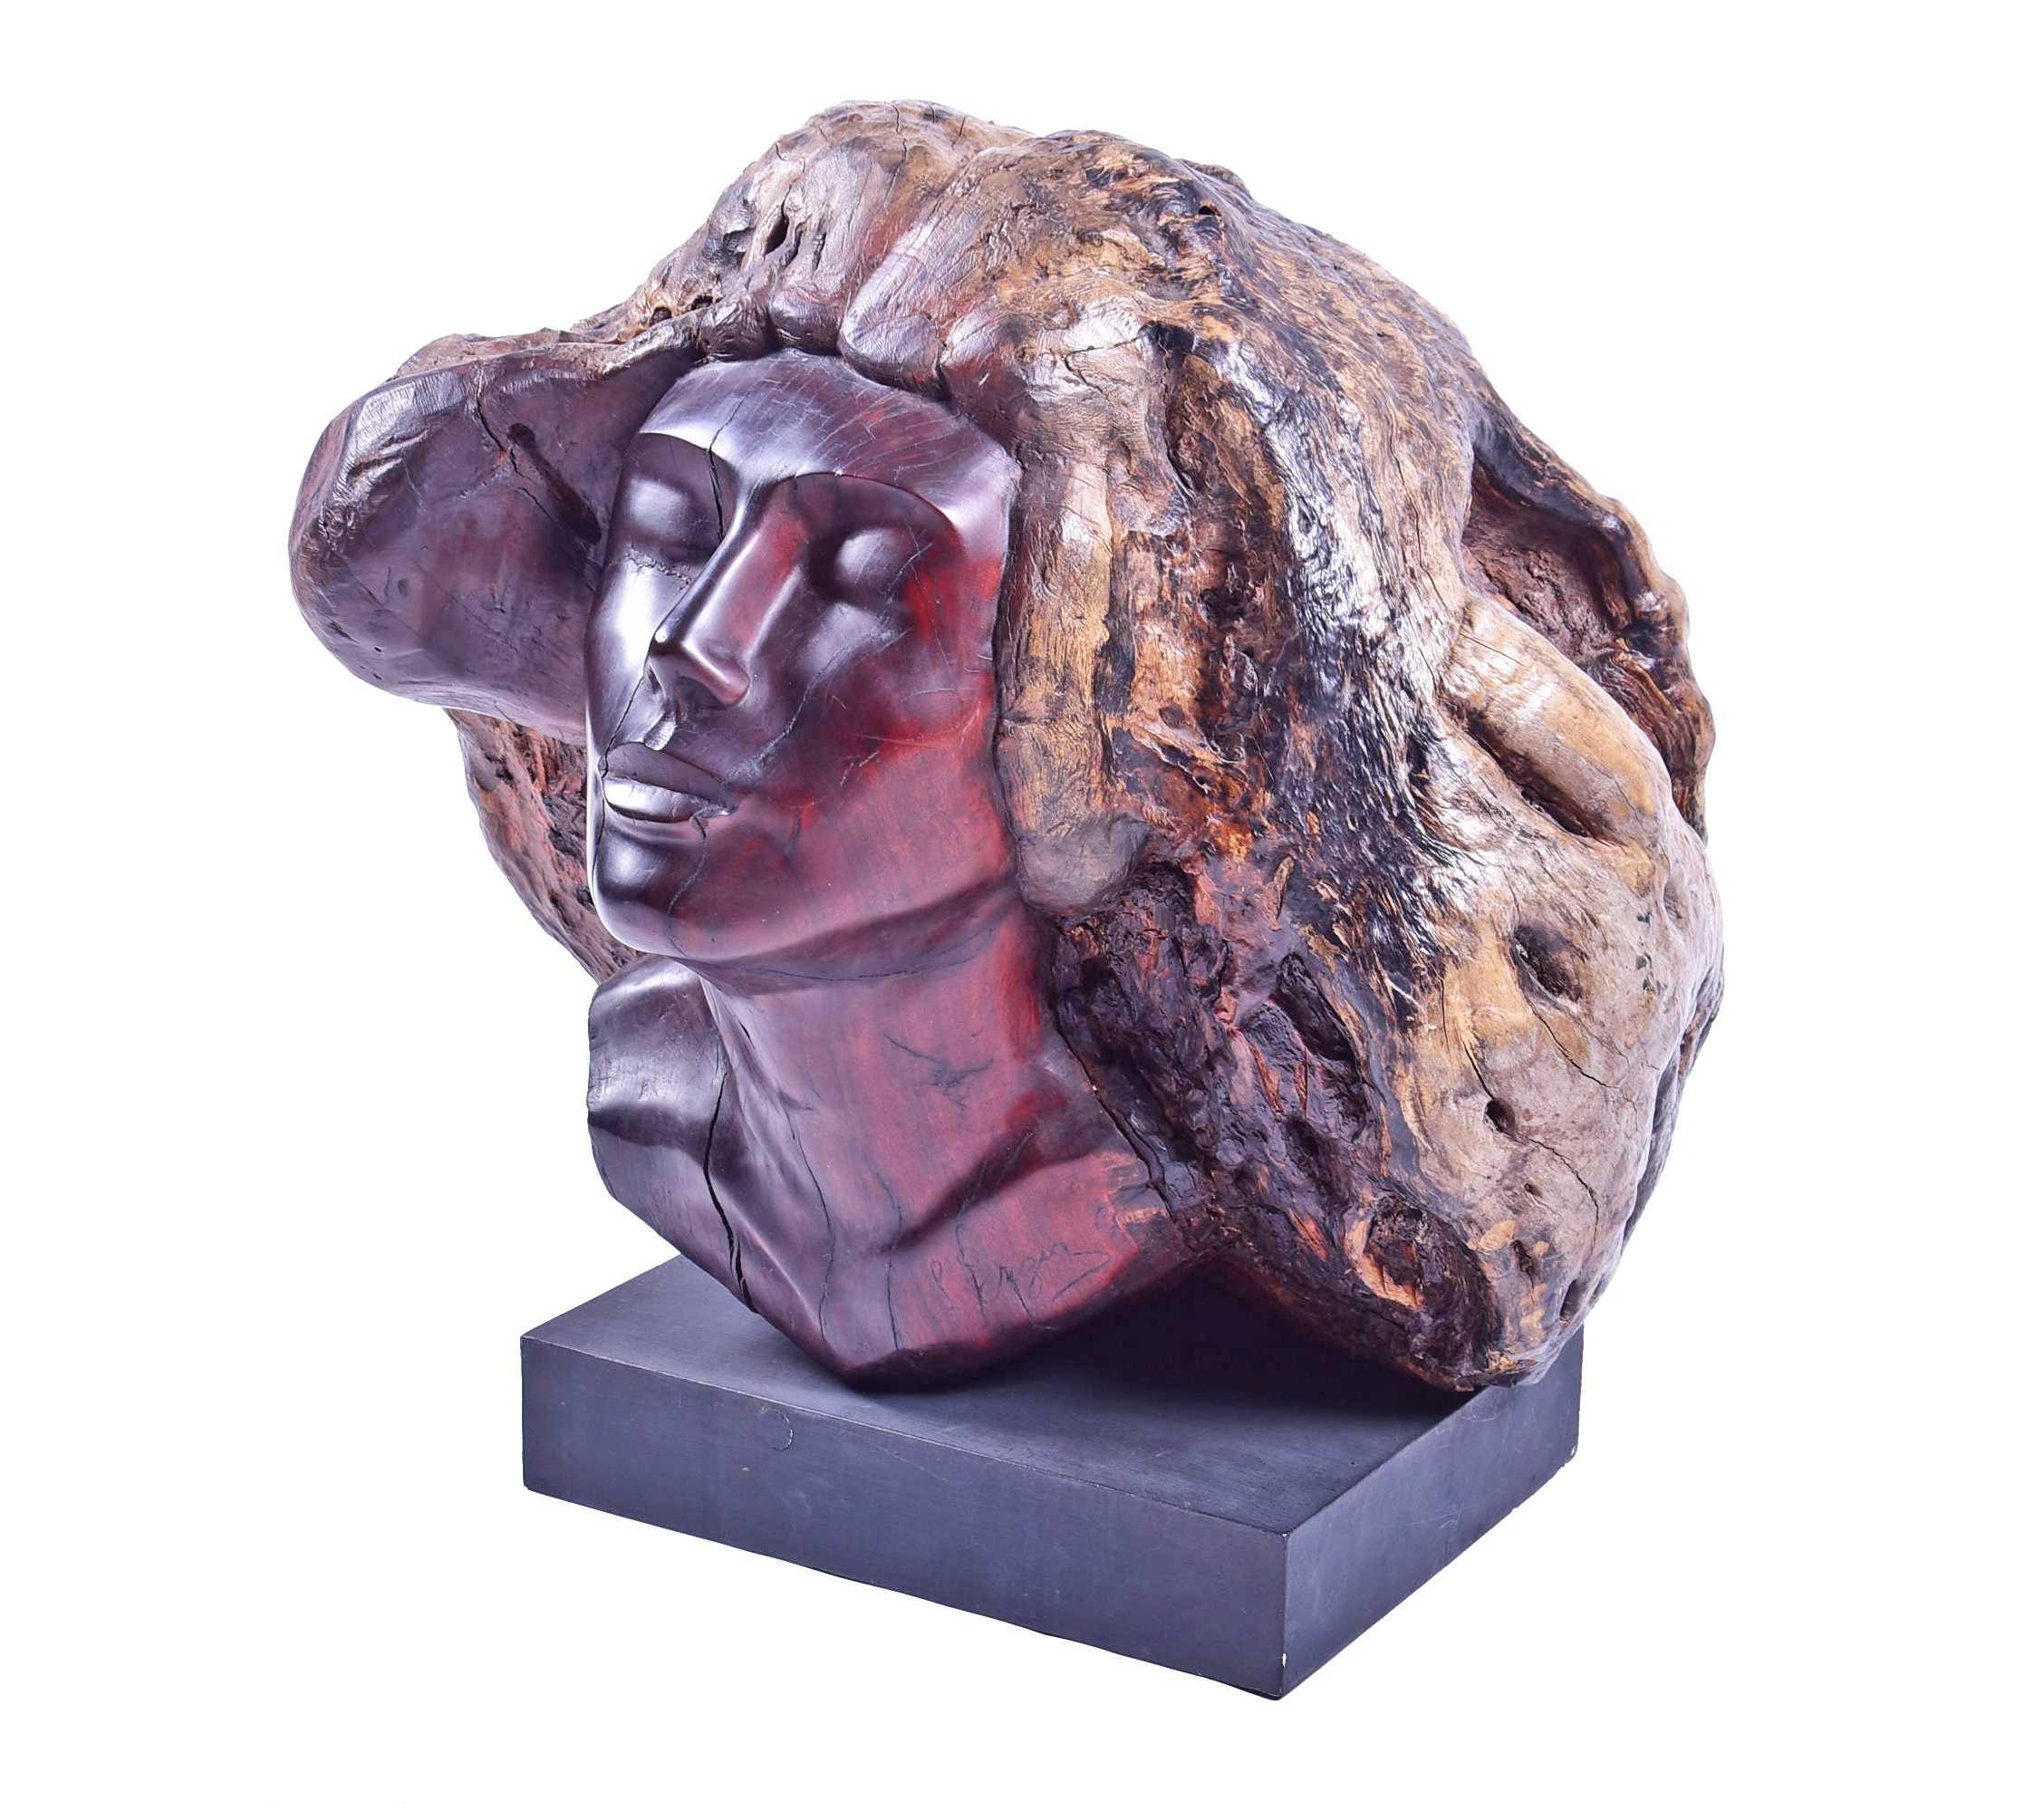 Stepan Dmitrievich Nefyodov Erzia Russian Head of a Woman. Sold for £31,500.